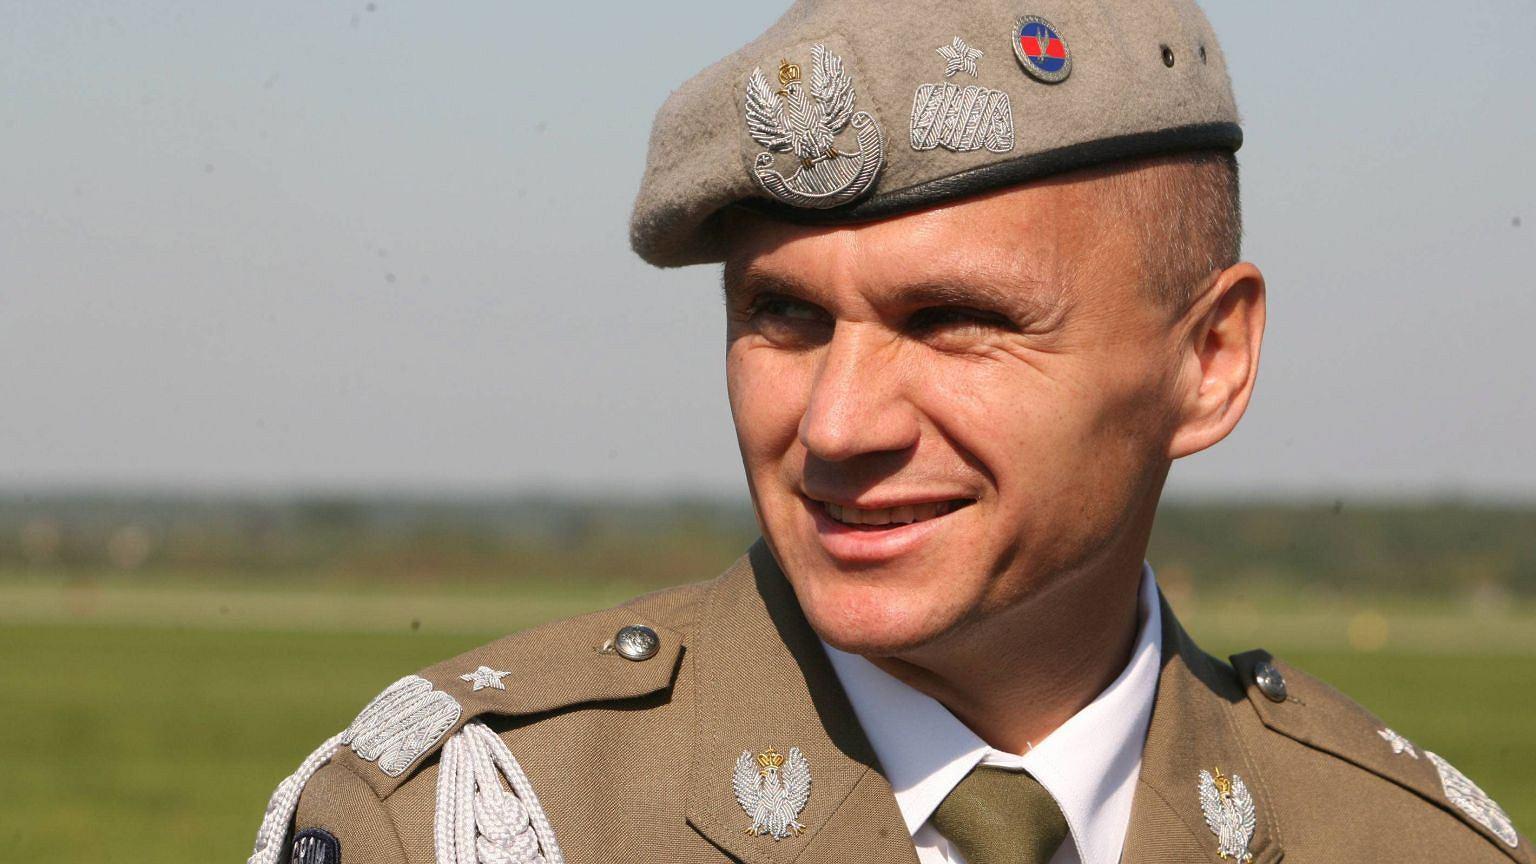 Generał Roman Polko w 2006 r.